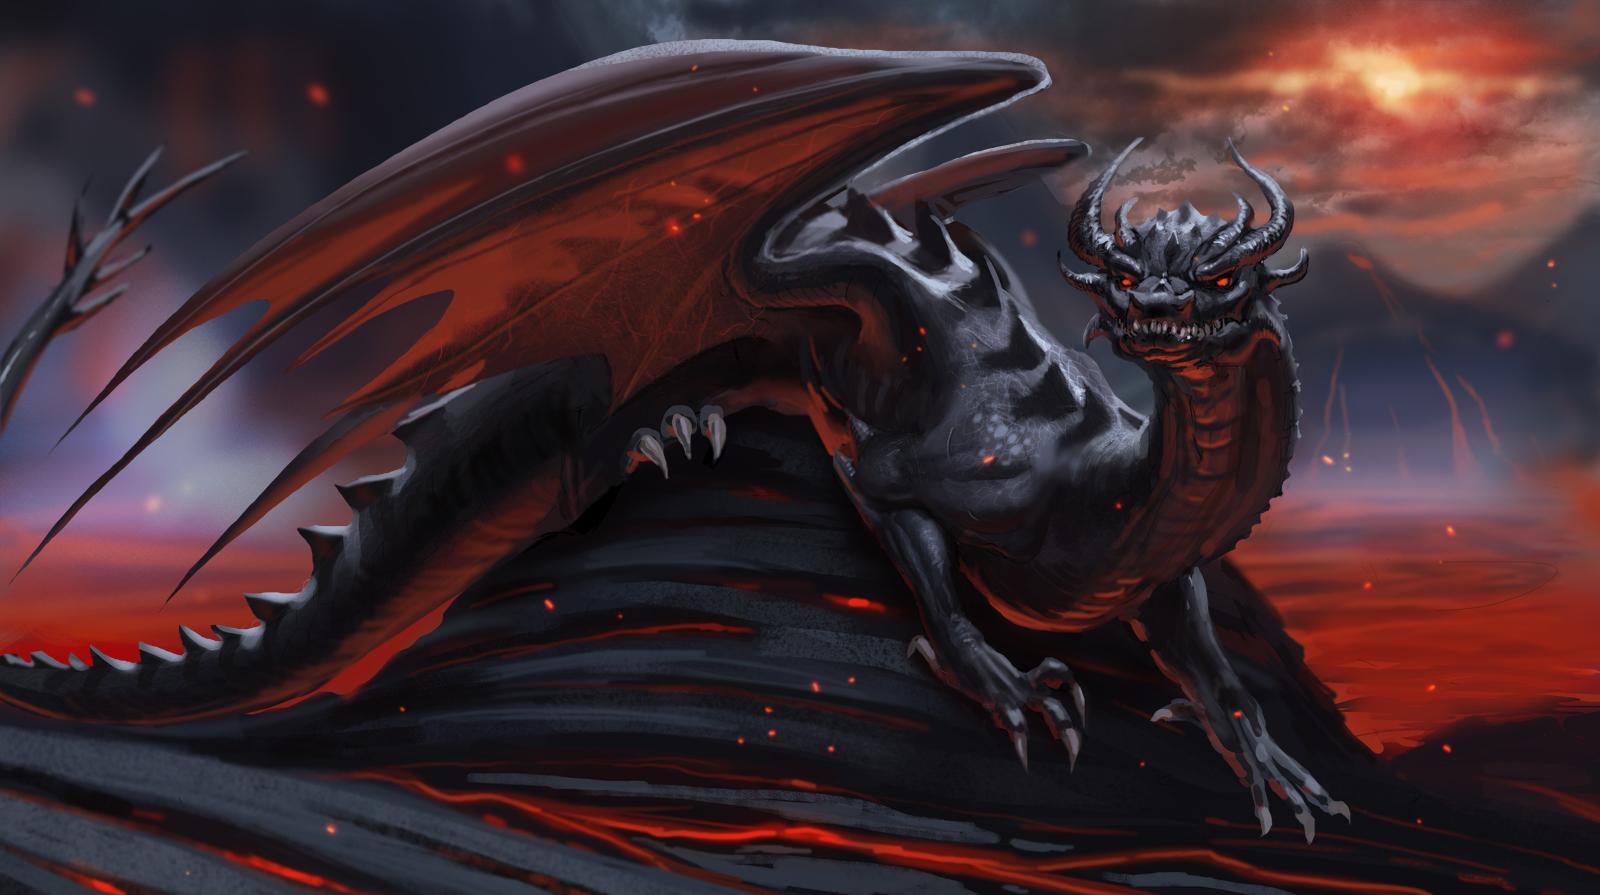 Lava Dragon By Detkef On DeviantArt